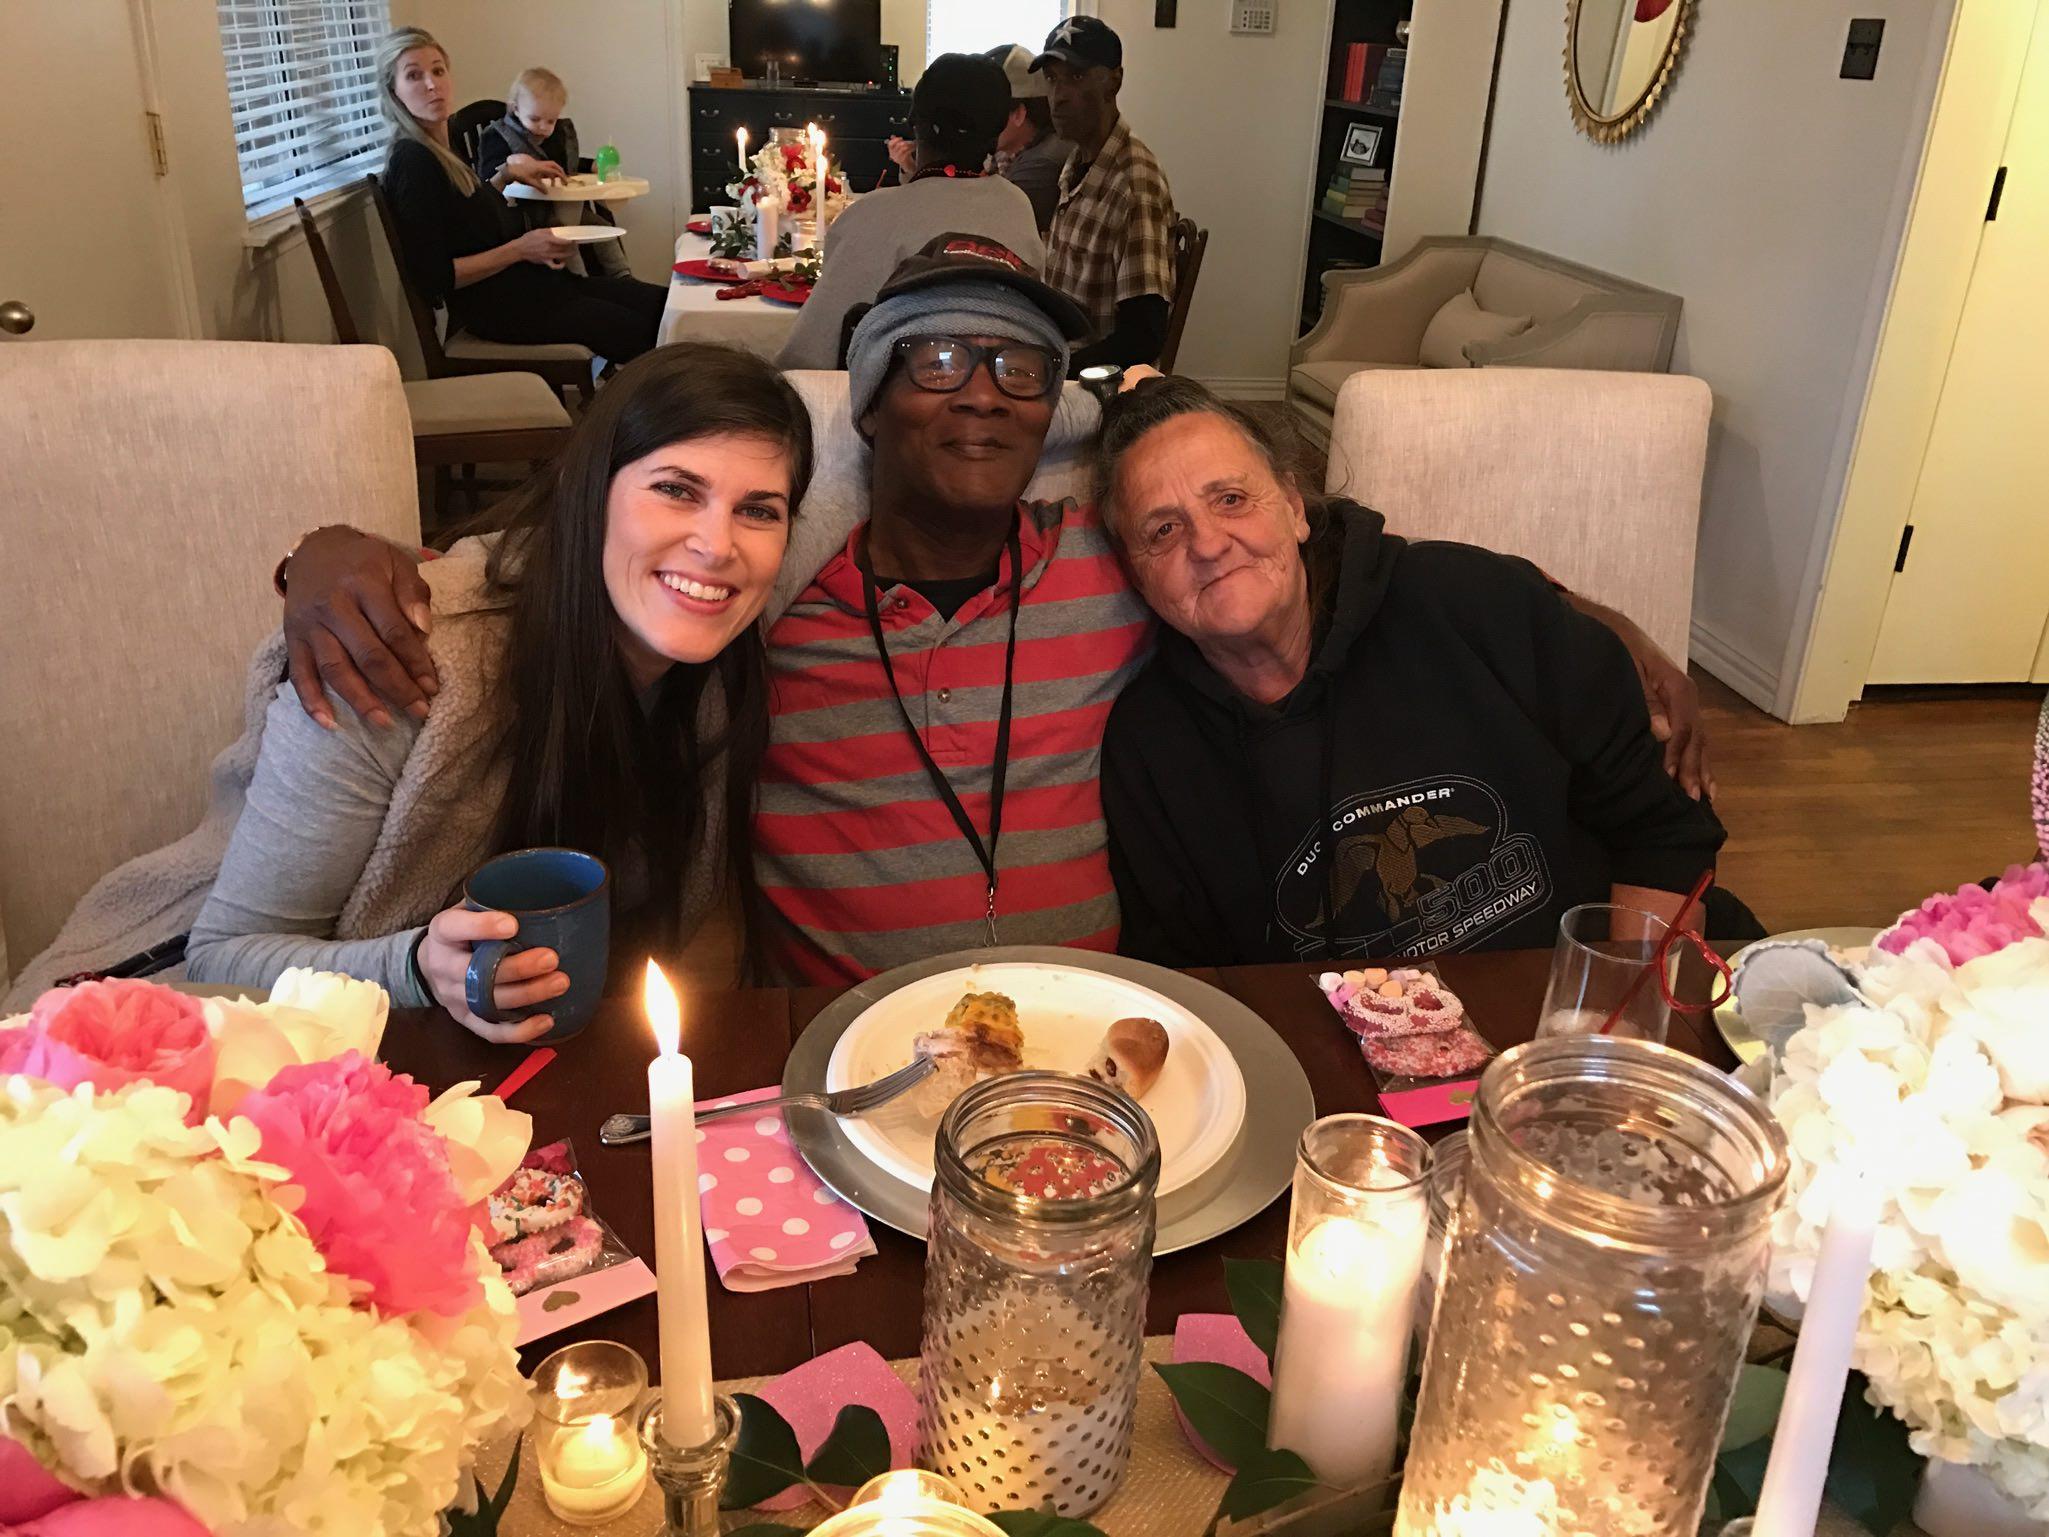 Rachel, Bobby, and Karin